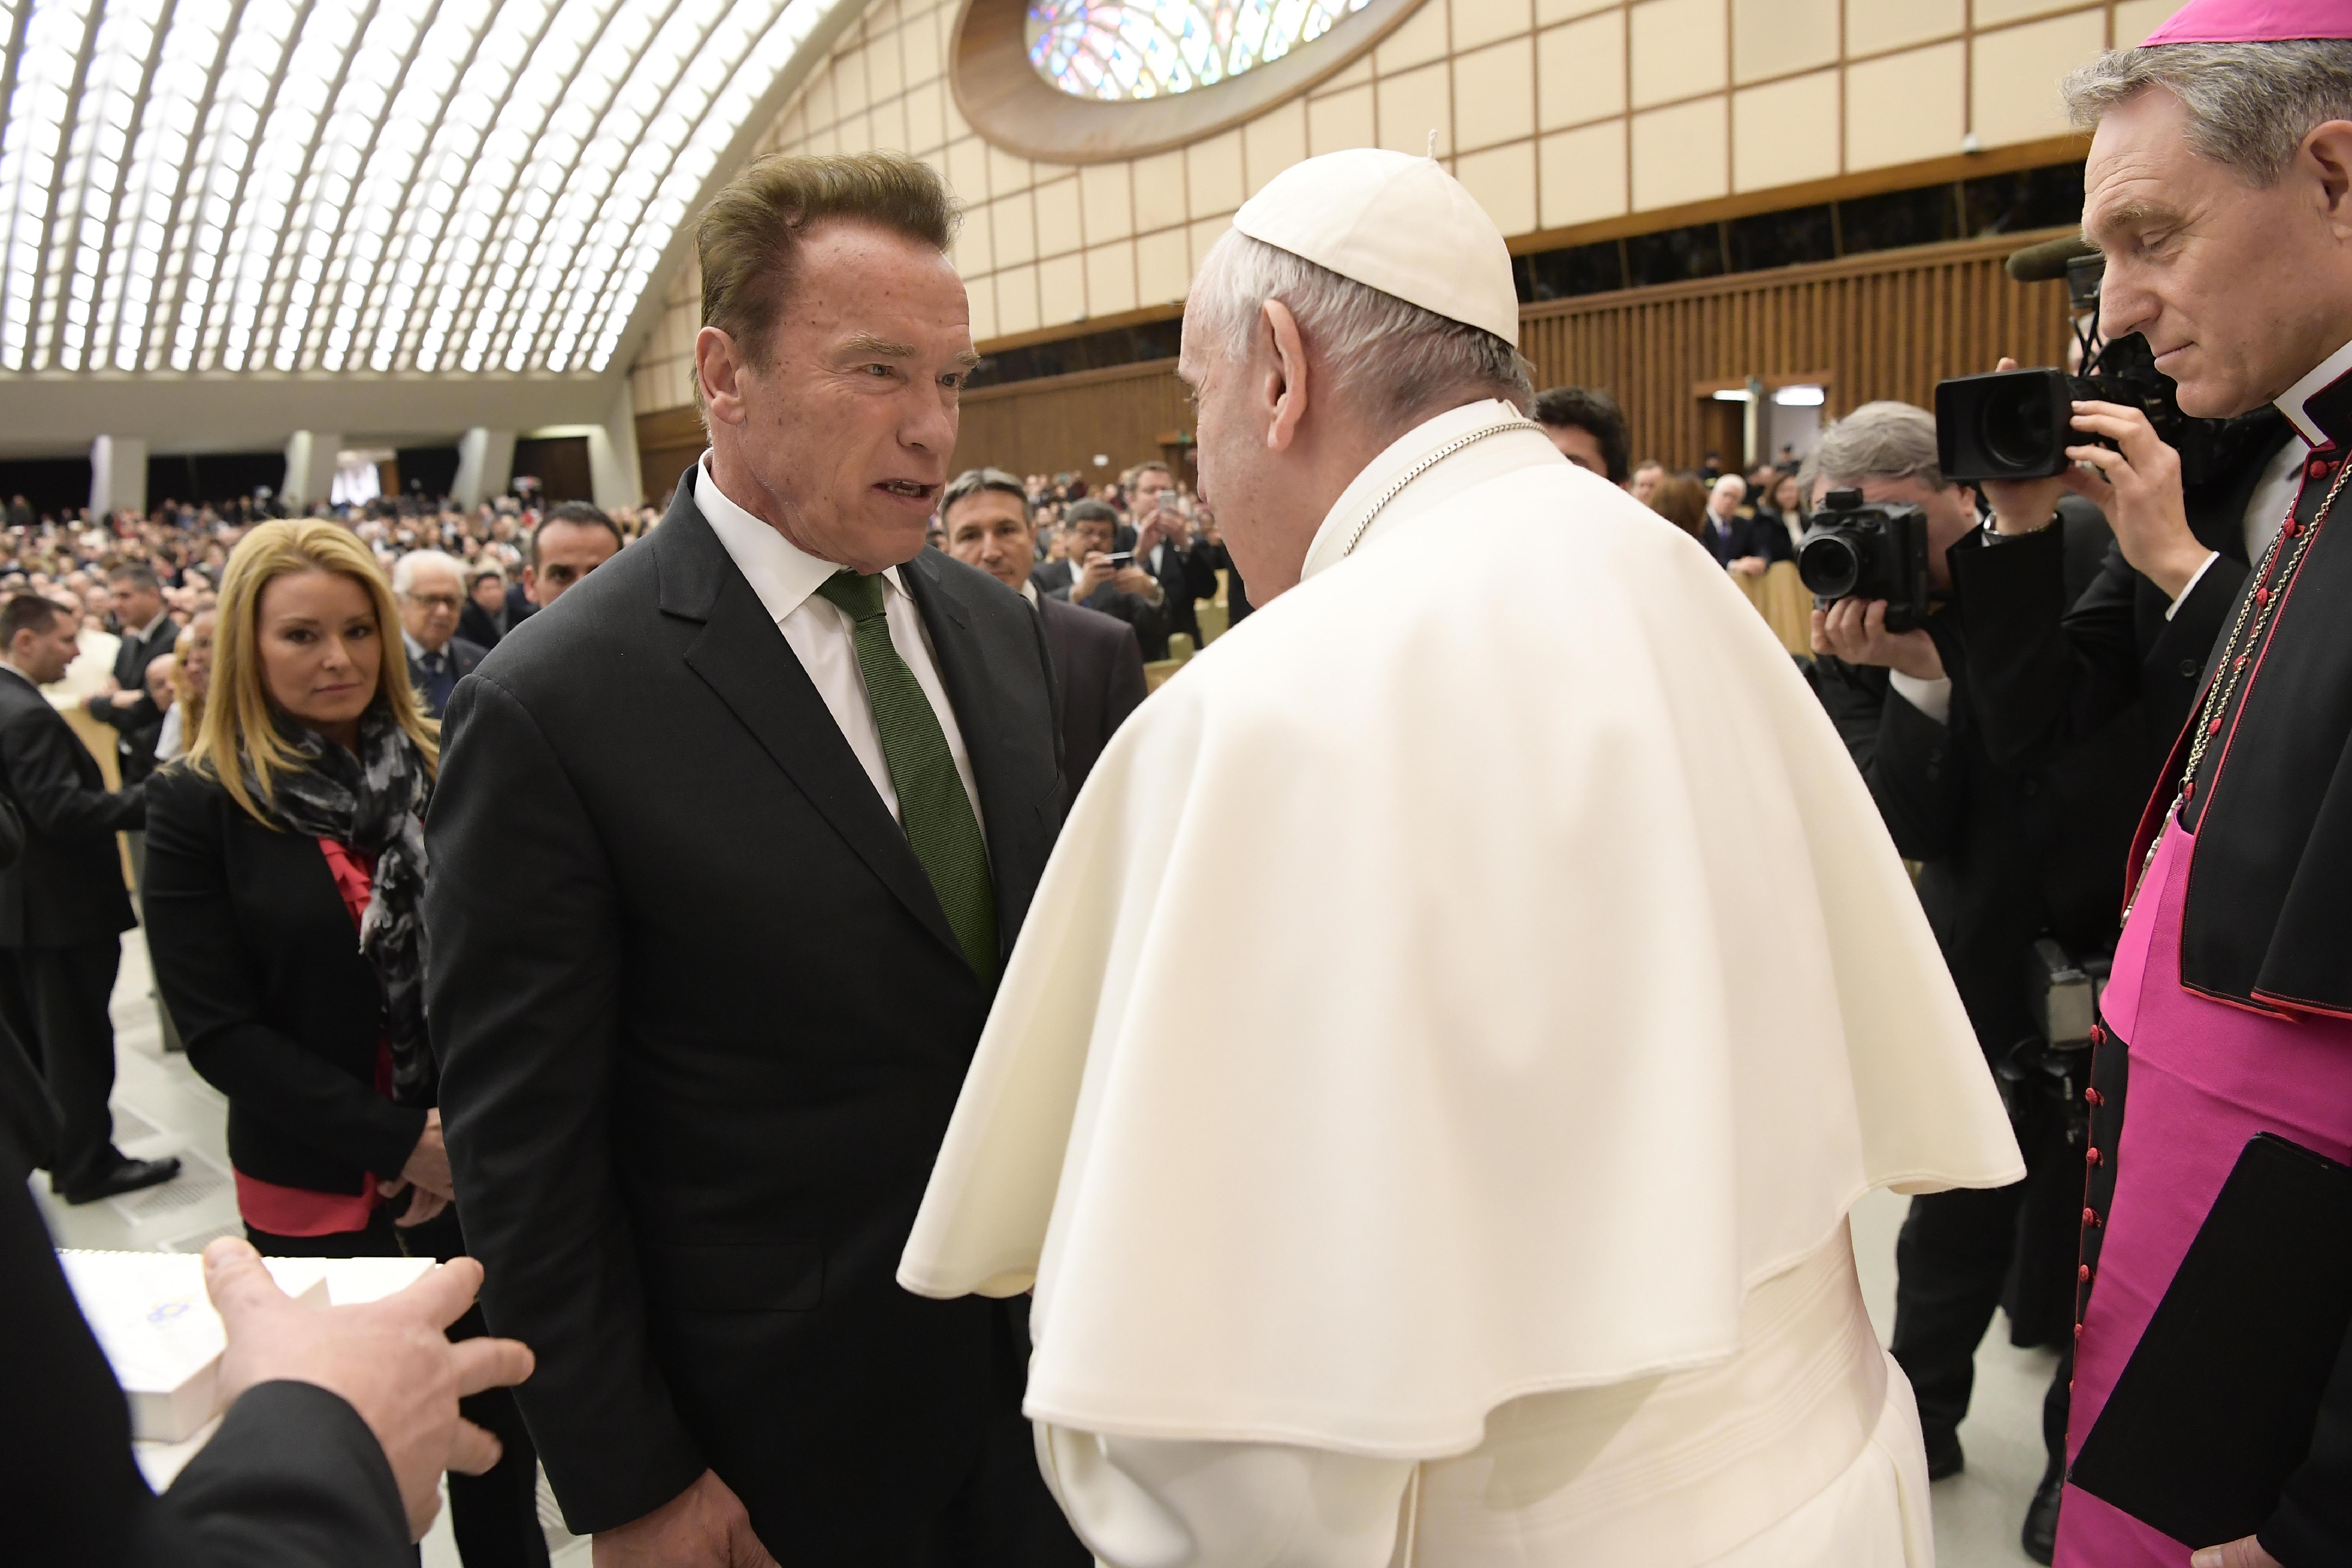 Arnold Schwarzenegger rencontre le pape © L'Osservatore Romano